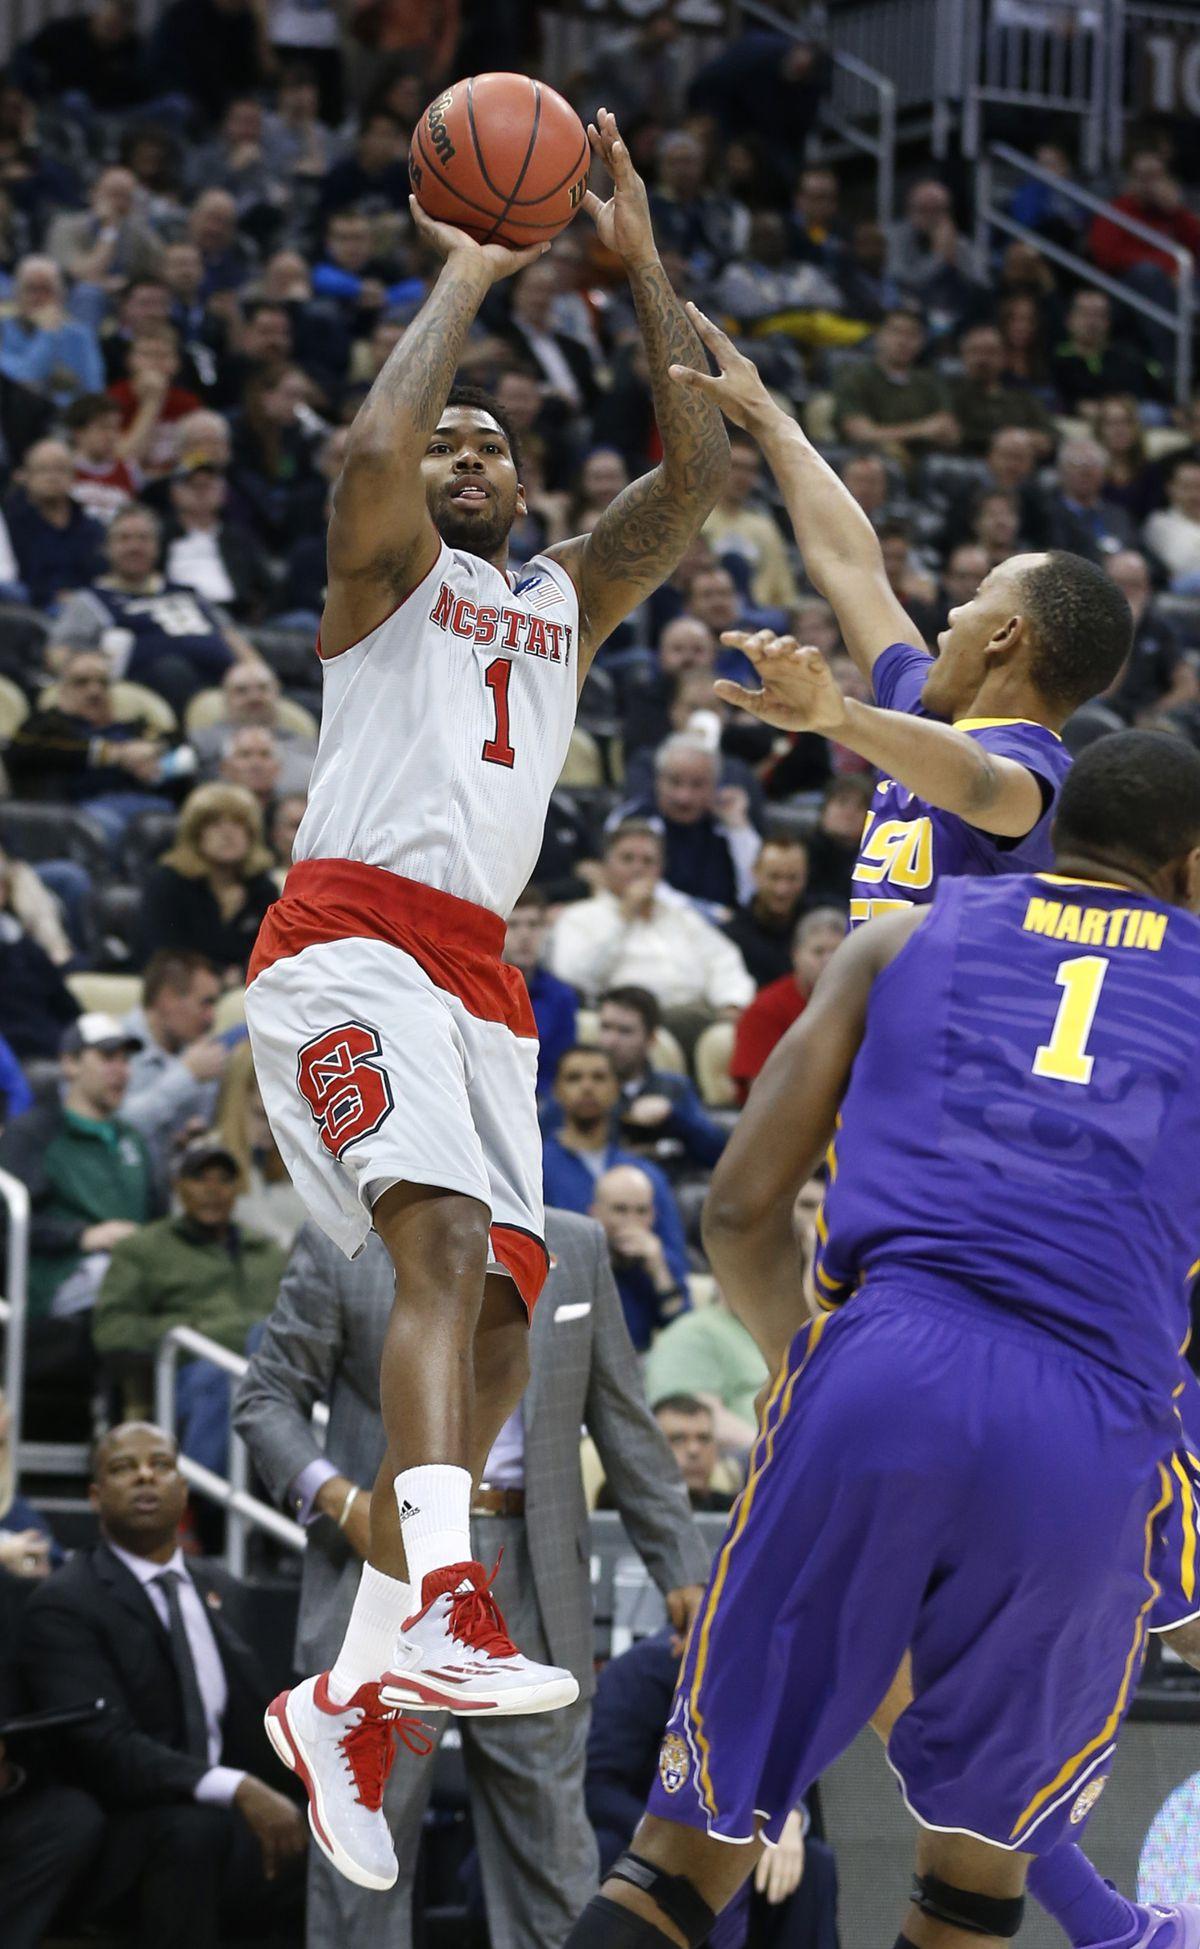 NCAA Tournament: Louisiana State vs. North Carolina State